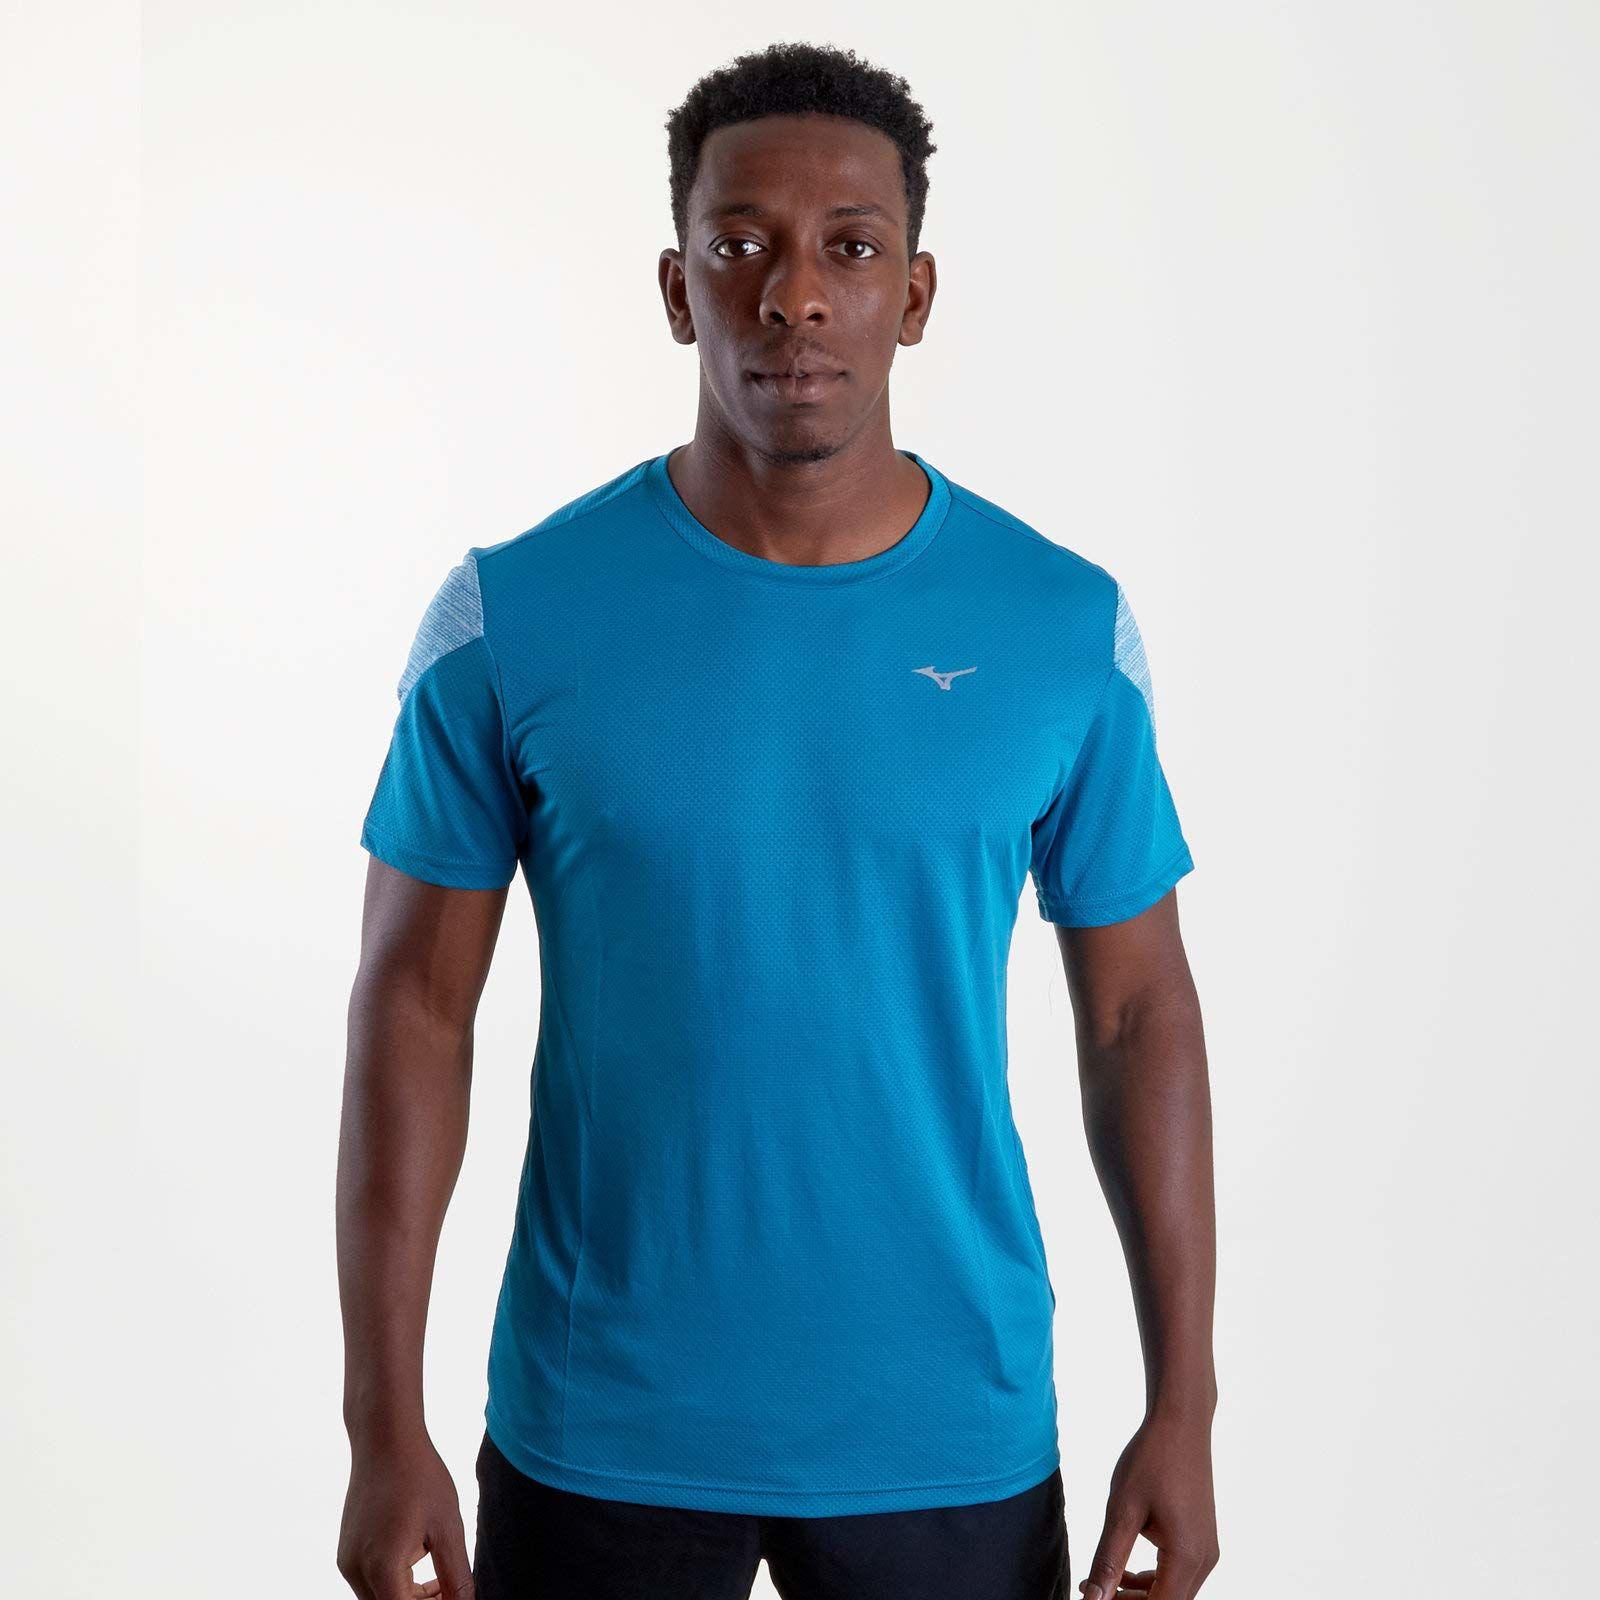 Mizuno Damska koszulka Flex Skort, niebieska (Brilliant Blue), XL